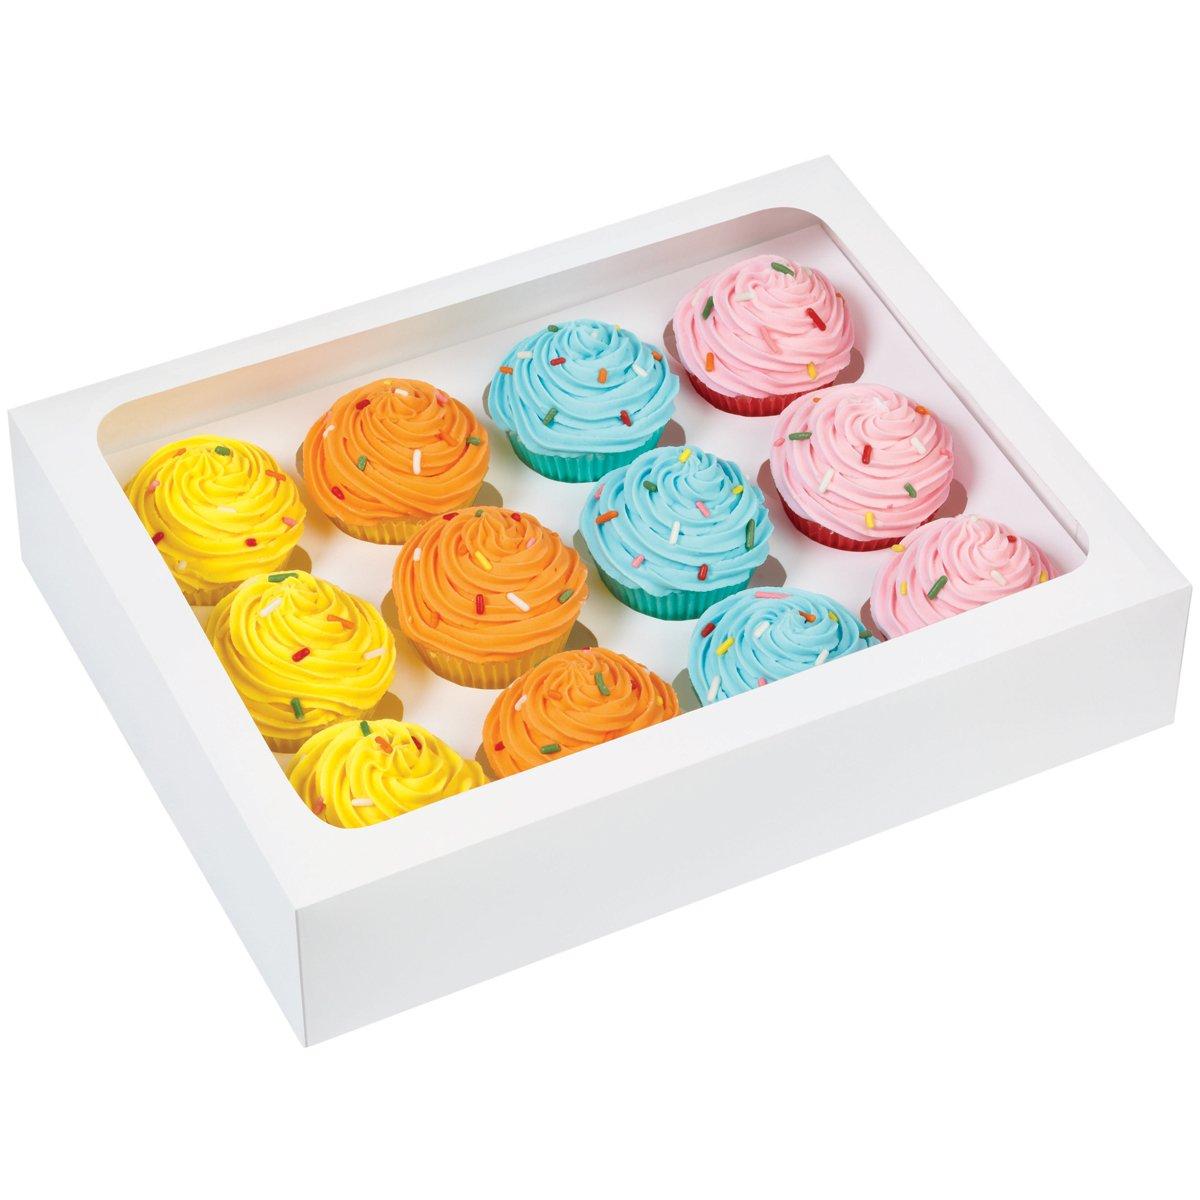 Wilton 415-1696 12-Cavity Cupcake Box, Mini White by Wilton (Image #1)